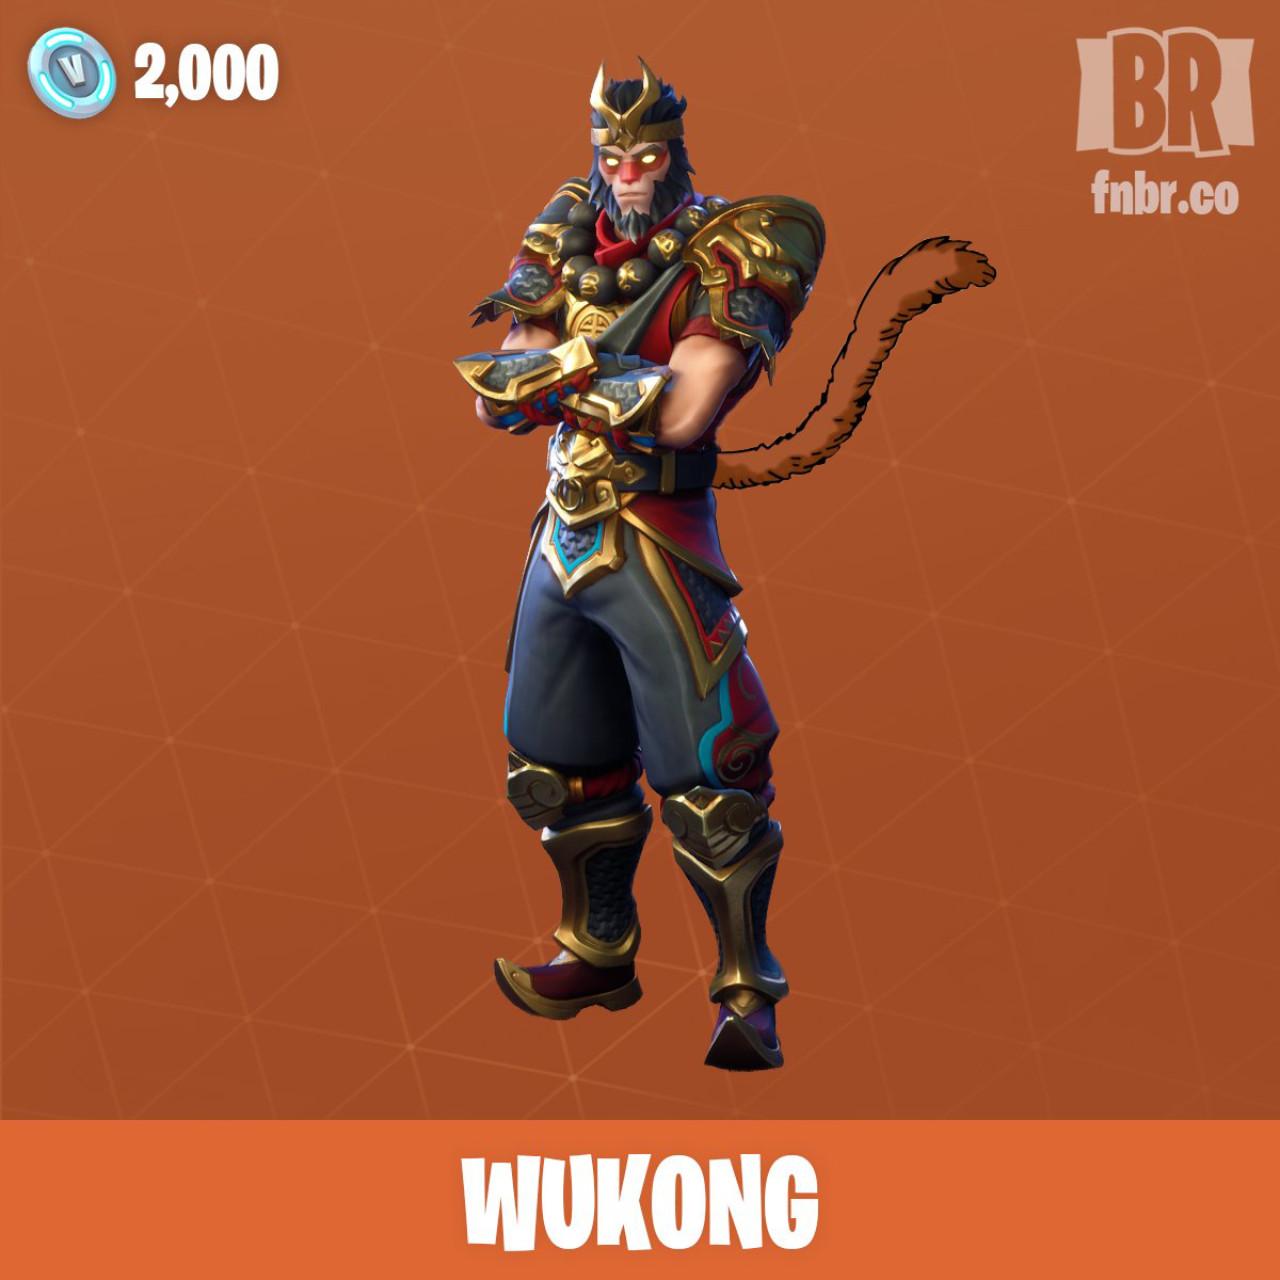 Wukong Fortnite - Epic Games